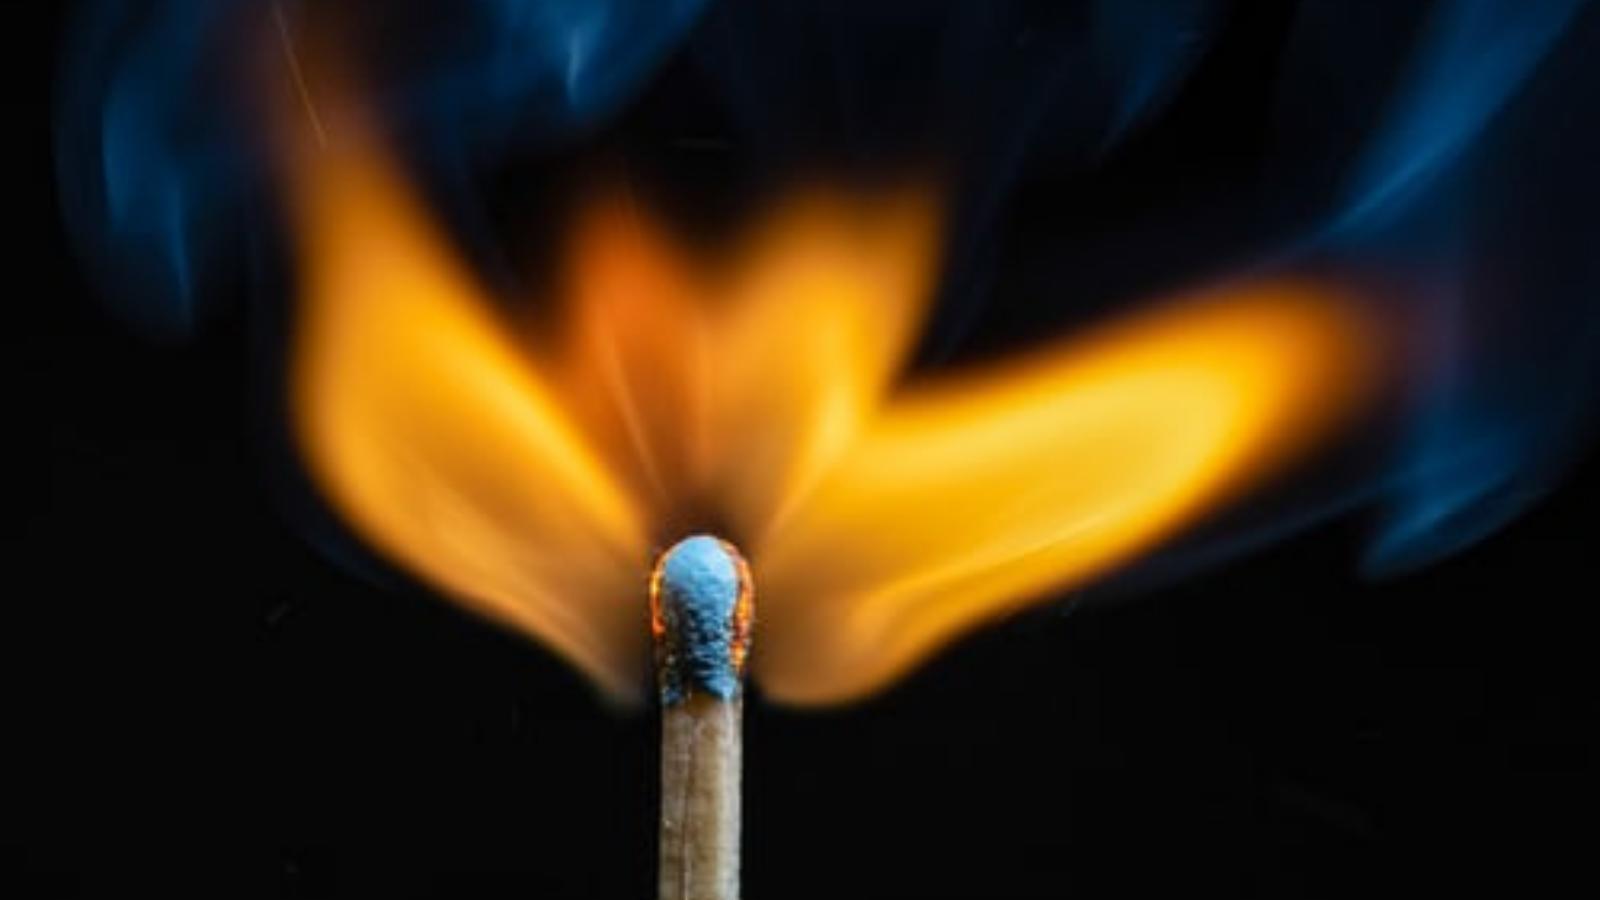 Meet my best friend: burnout